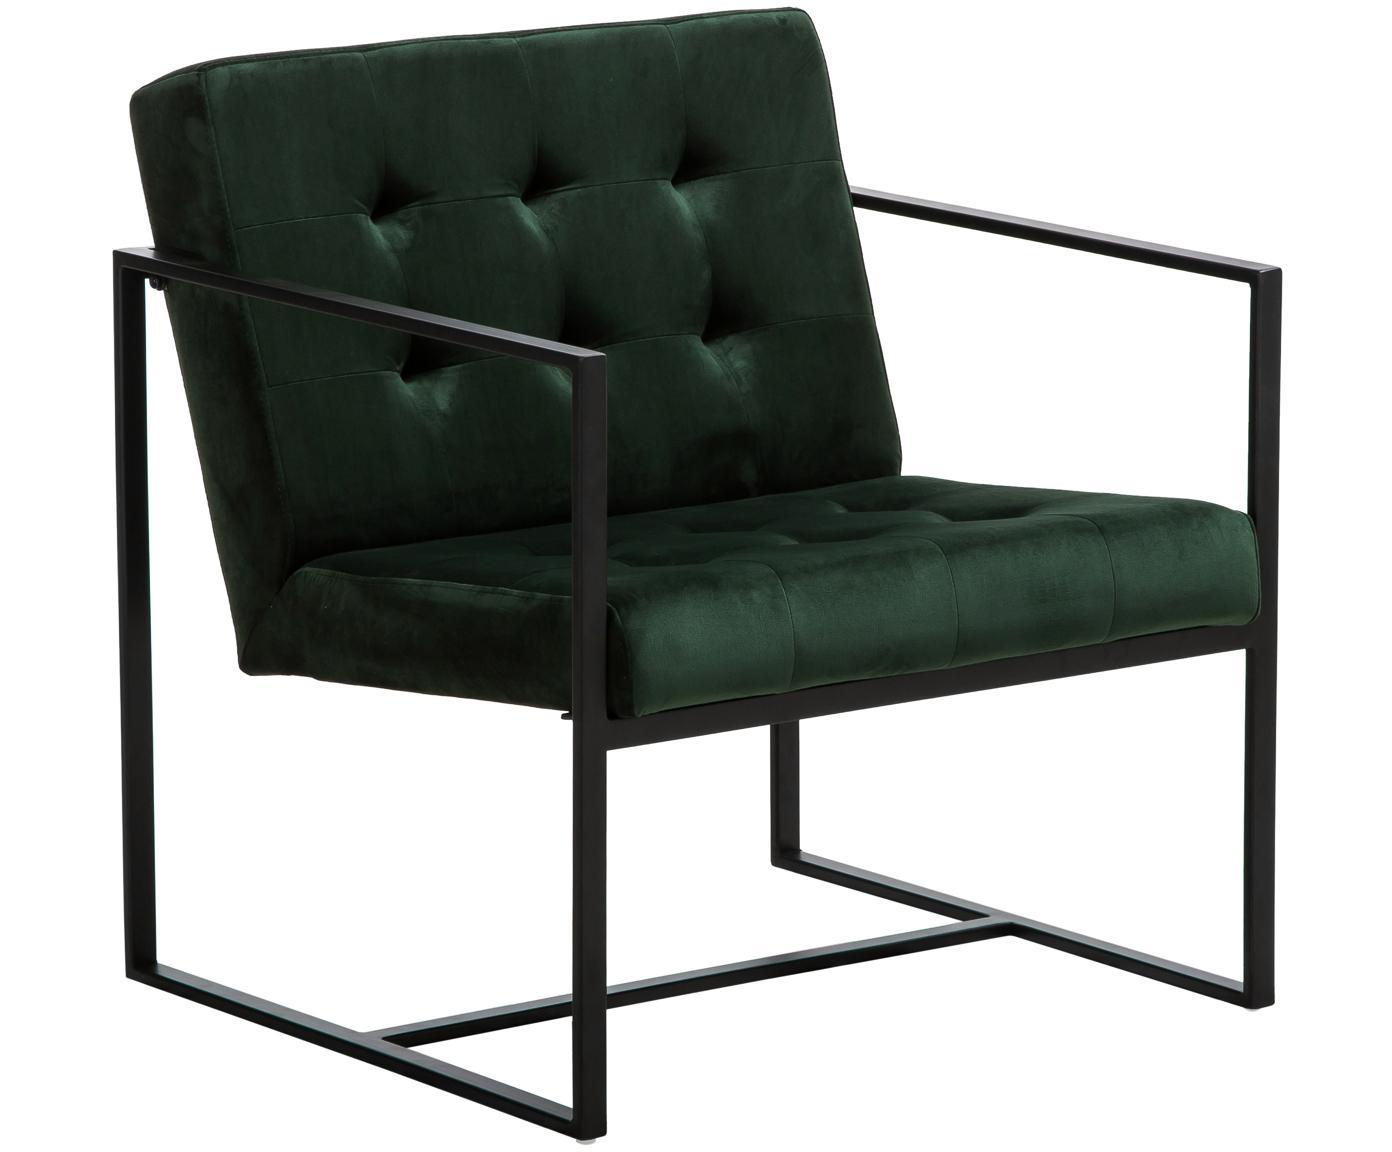 Fluwelen fauteuil Manhattan, Bekleding: fluweel (polyester), Frame: gepoedercoat metaal, Donkergroen, B 70 x D 72 cm